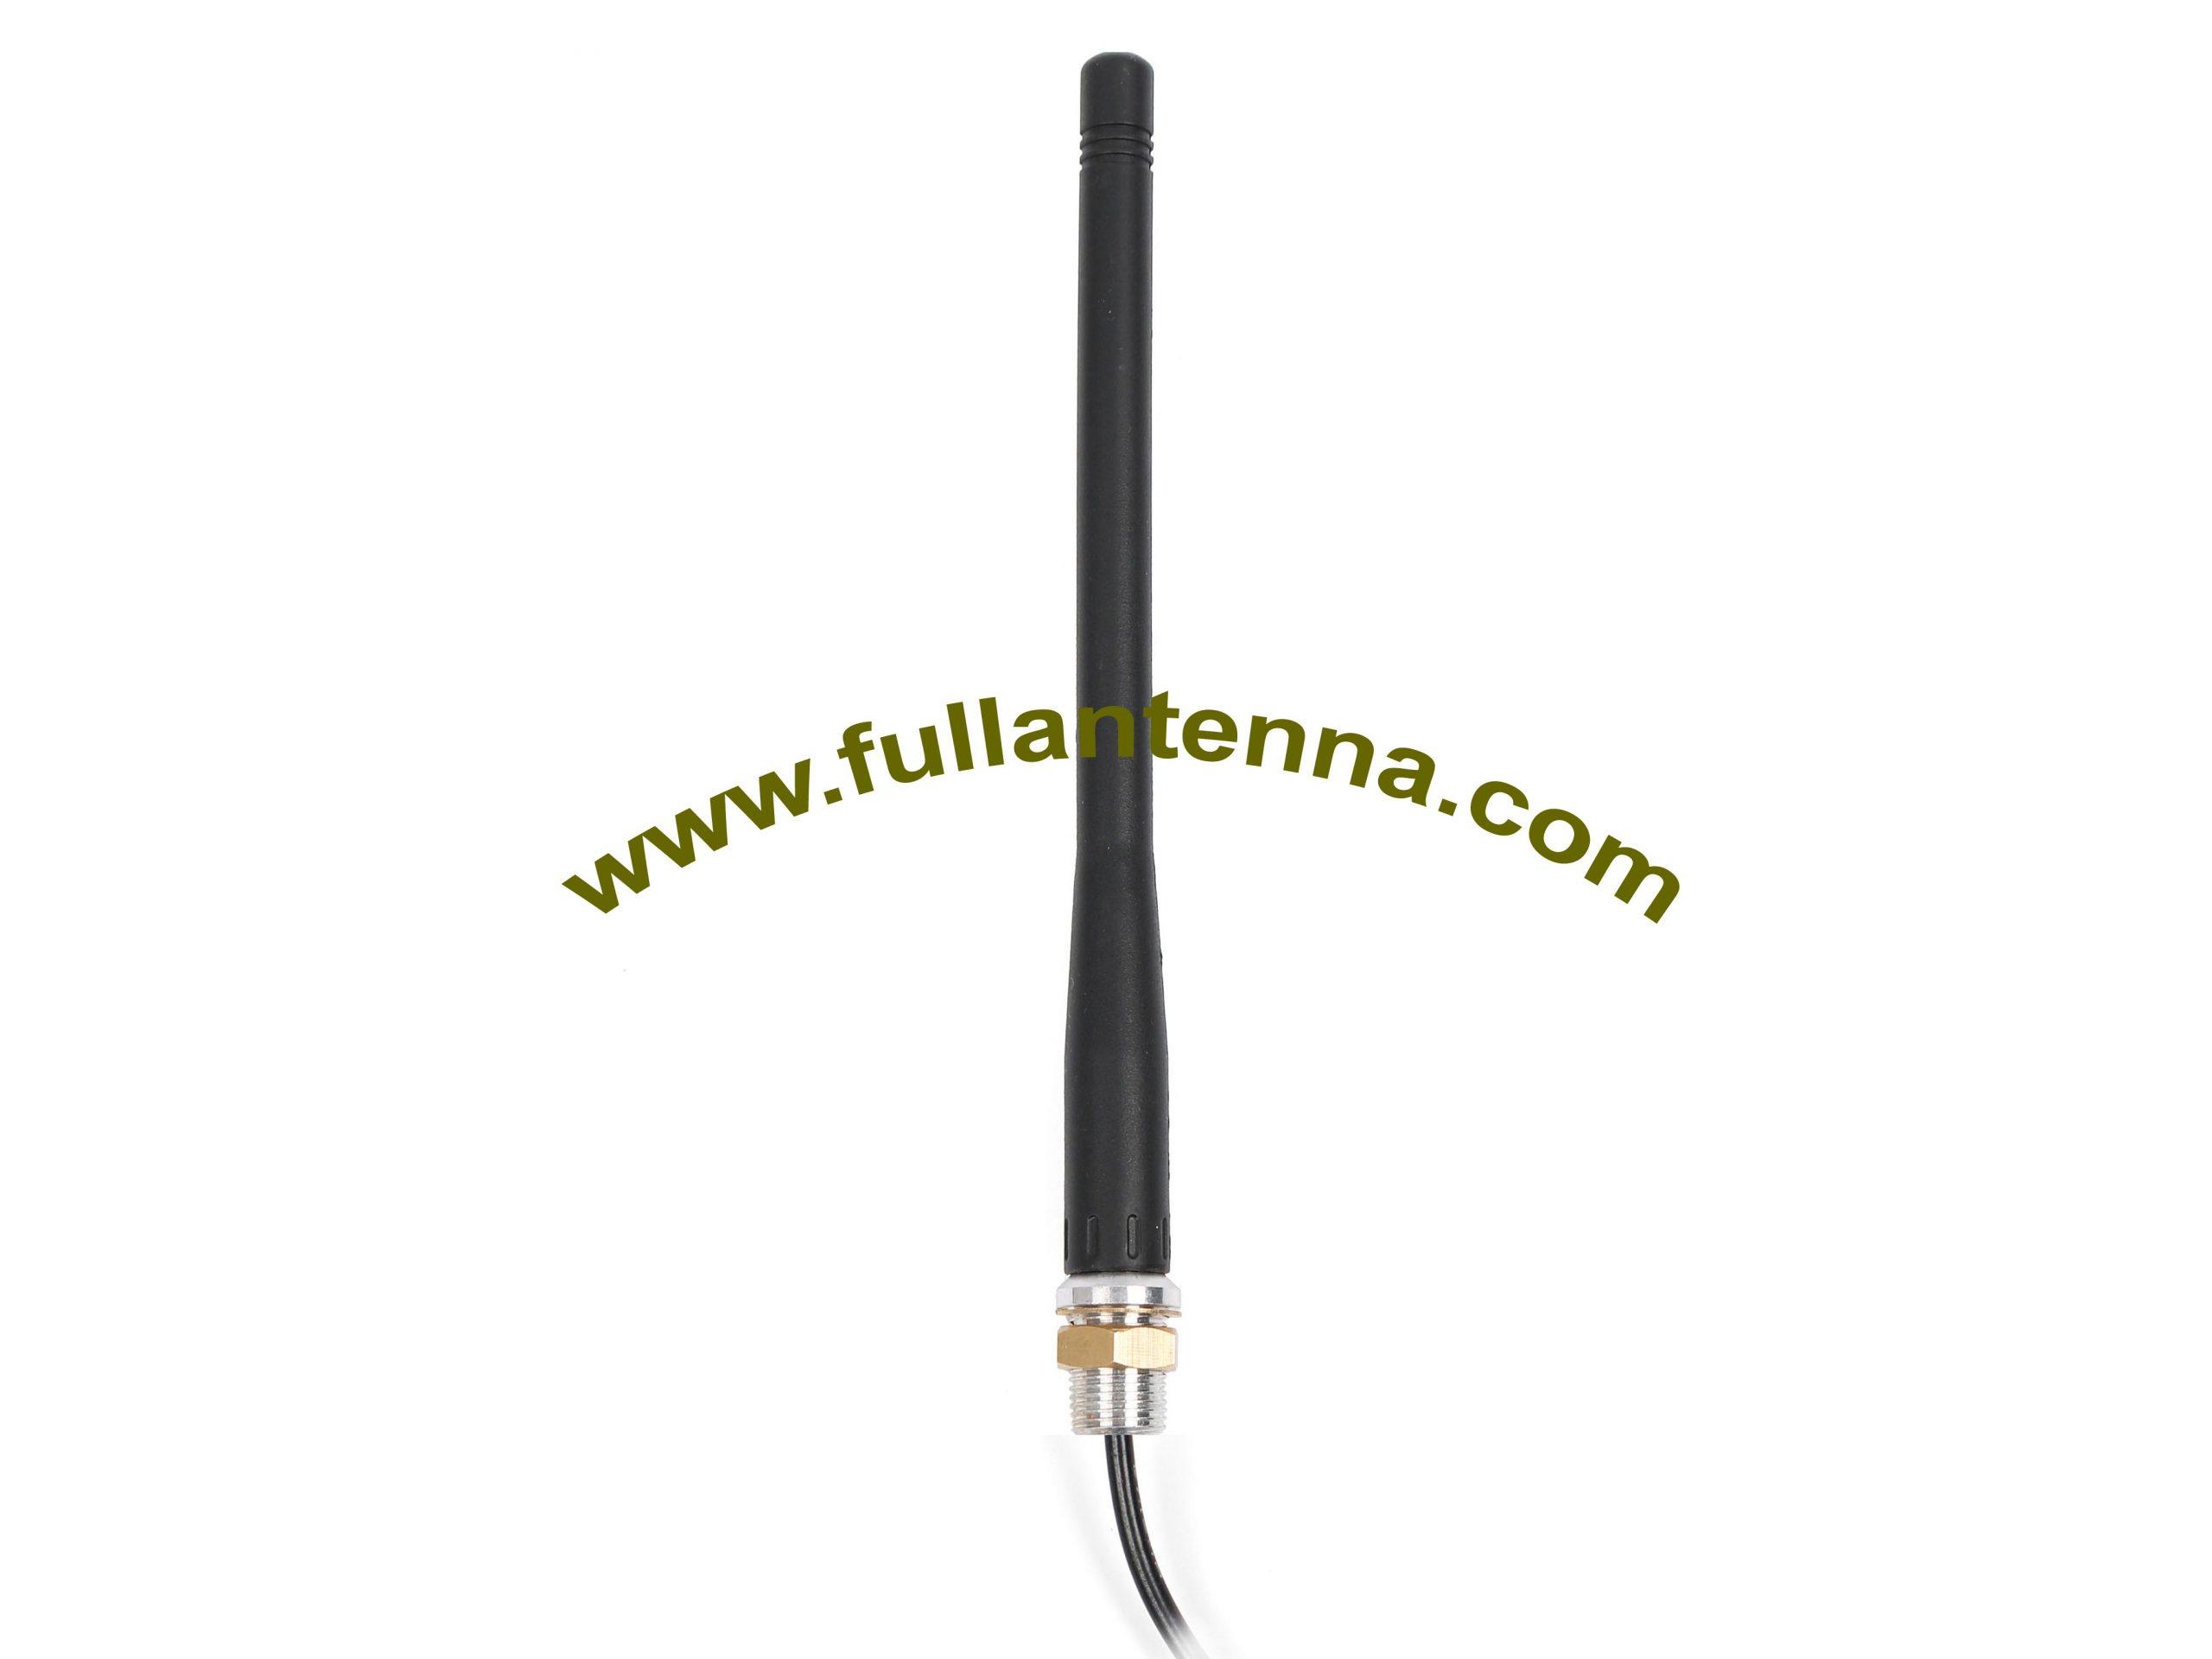 P/N:FALTE.0303Screw,4G/LTE External Antenna,LTE/4G antenna rubber whip screw mount